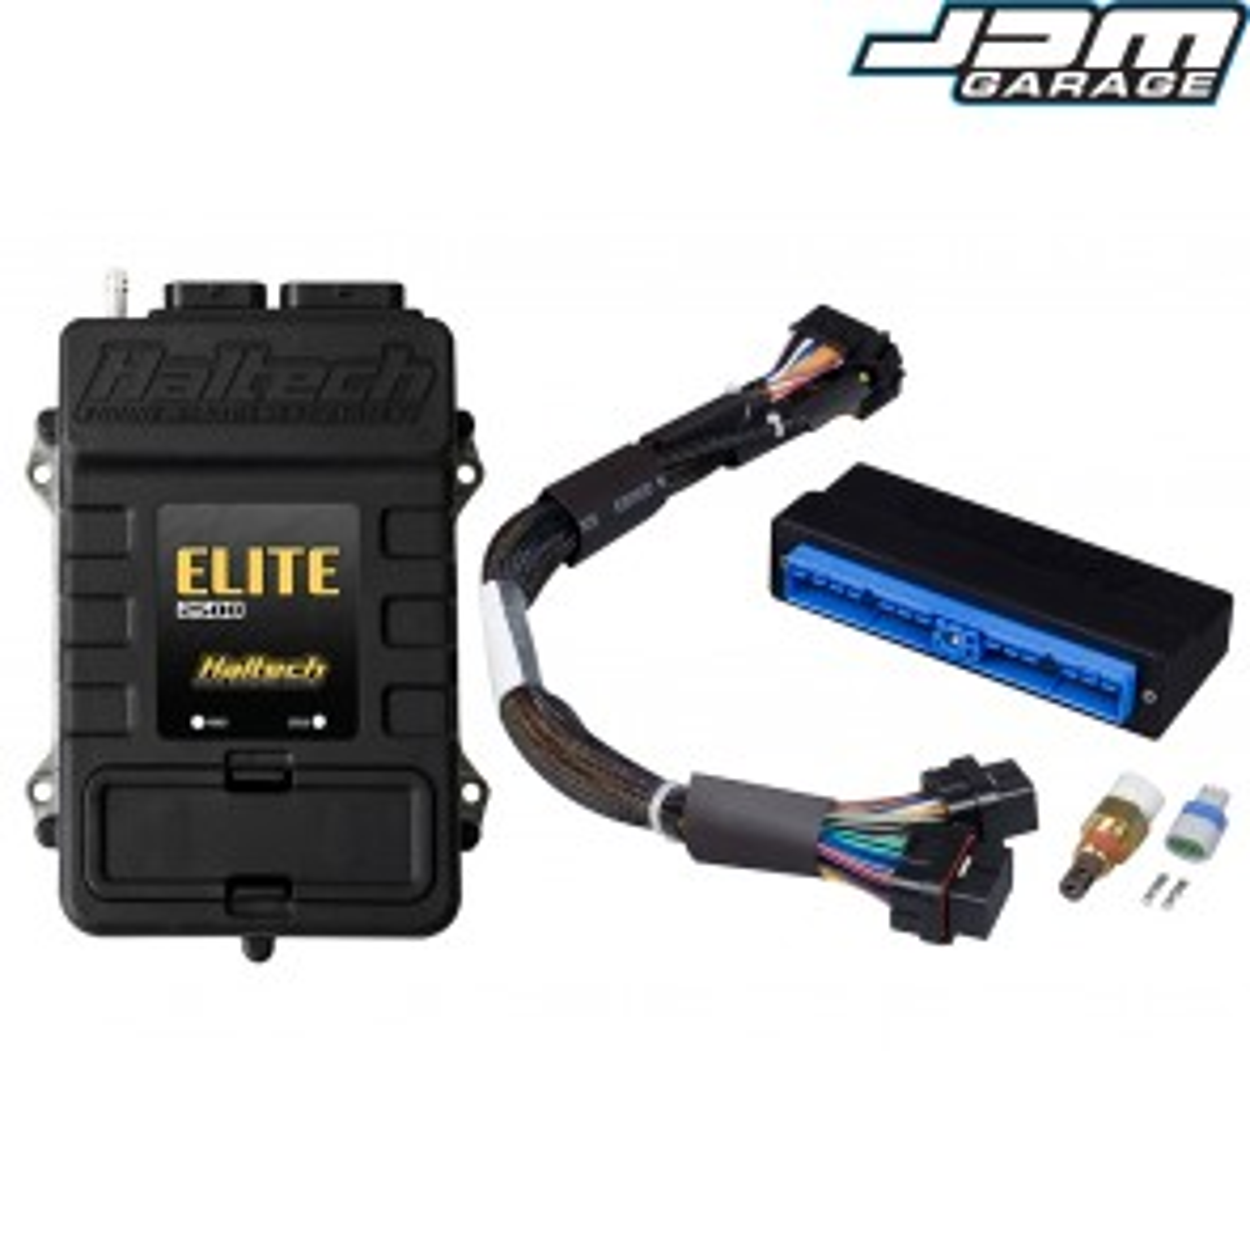 Haltech Elite 2500+ ECU Nissan Skyline R32 R33 GTST R34 GT-R With Plug'n'Play Adaptor Harness Kit